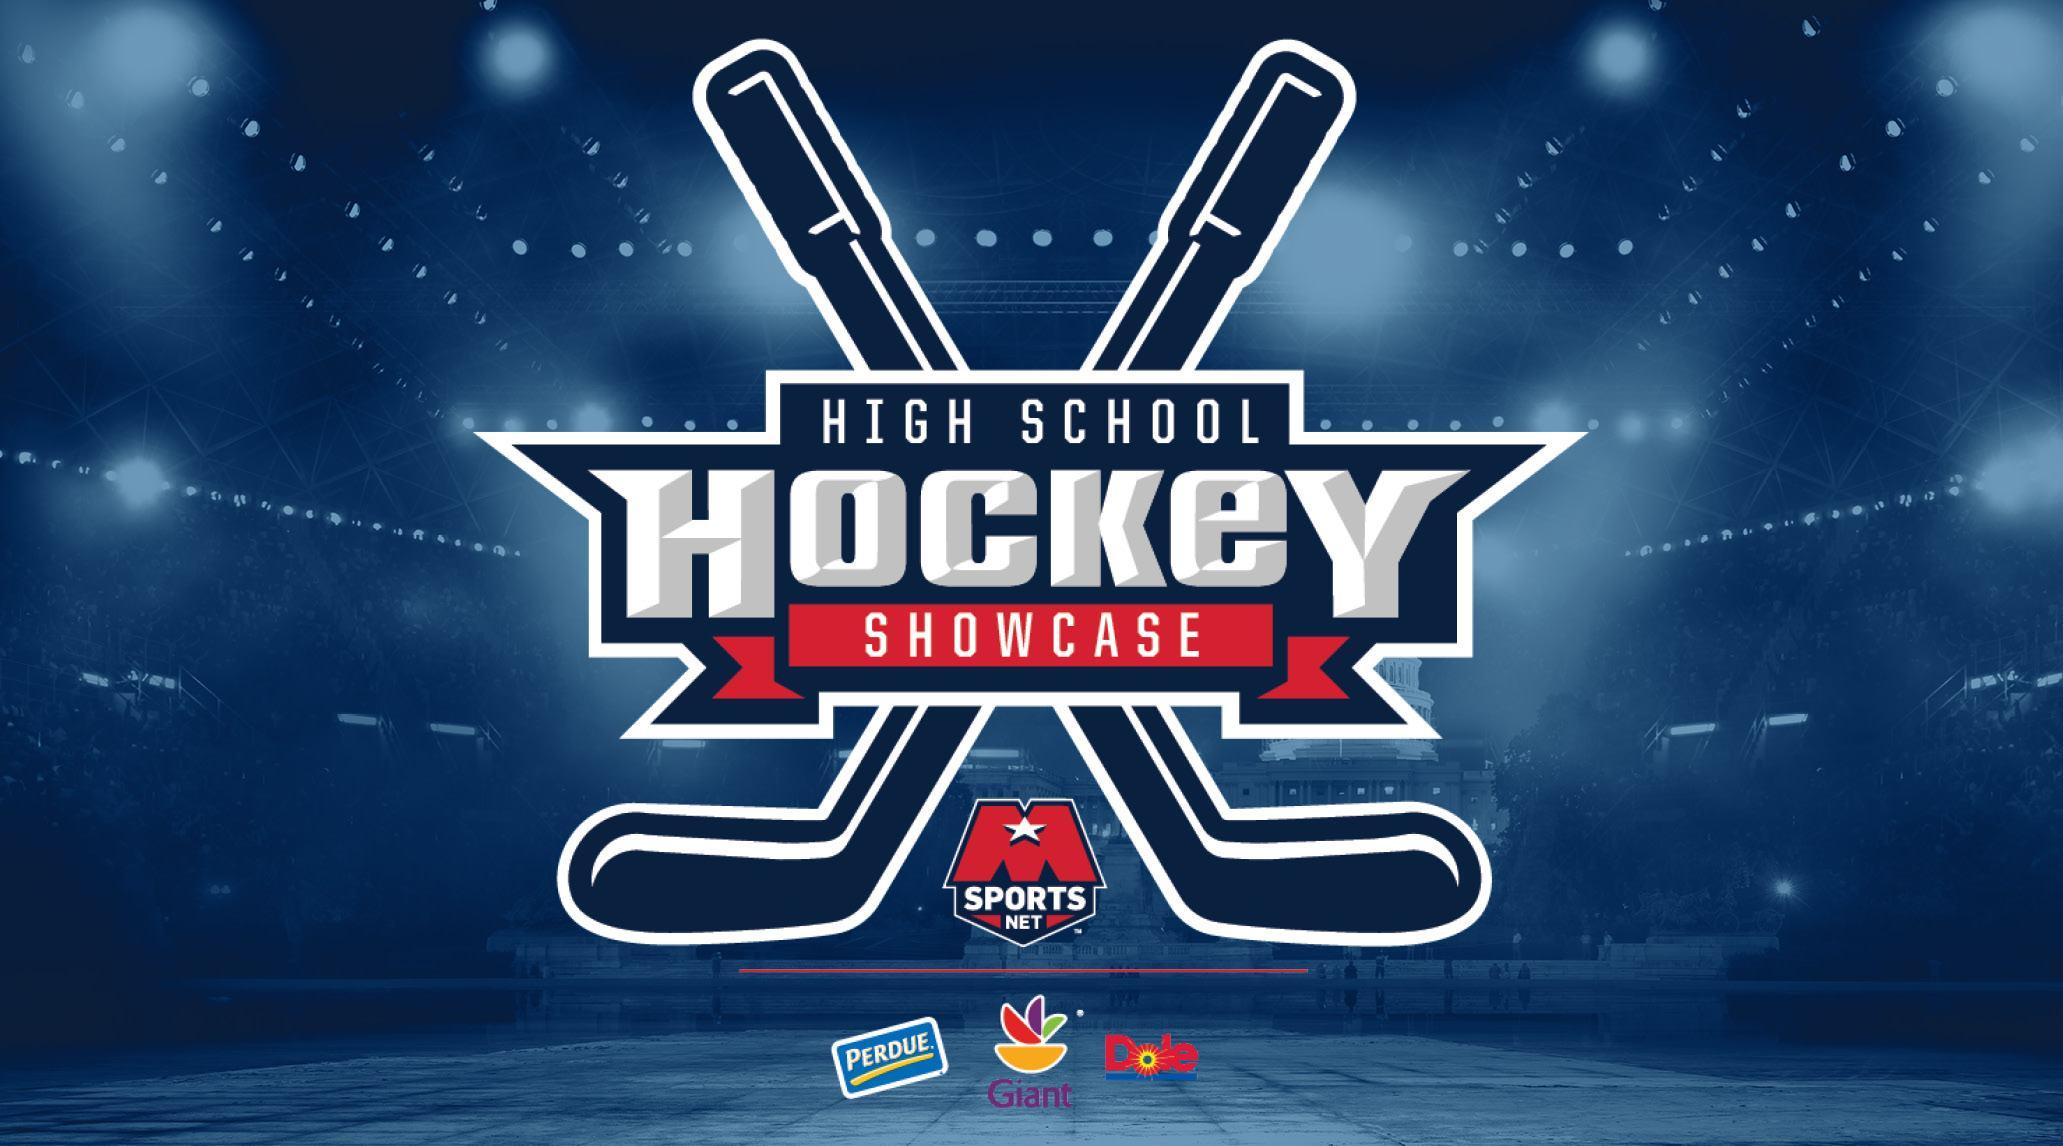 St Albans Giant HS Hockey Showcase